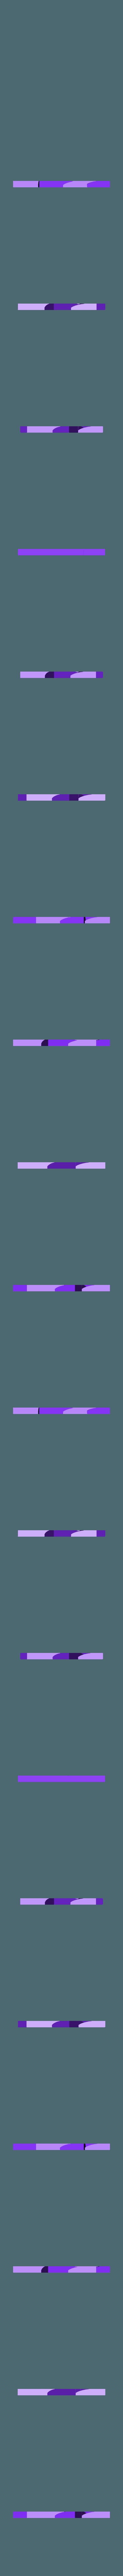 starofdavid.STL Download STL file Jewerly 3D printing • 3D printer object, capoboris199423